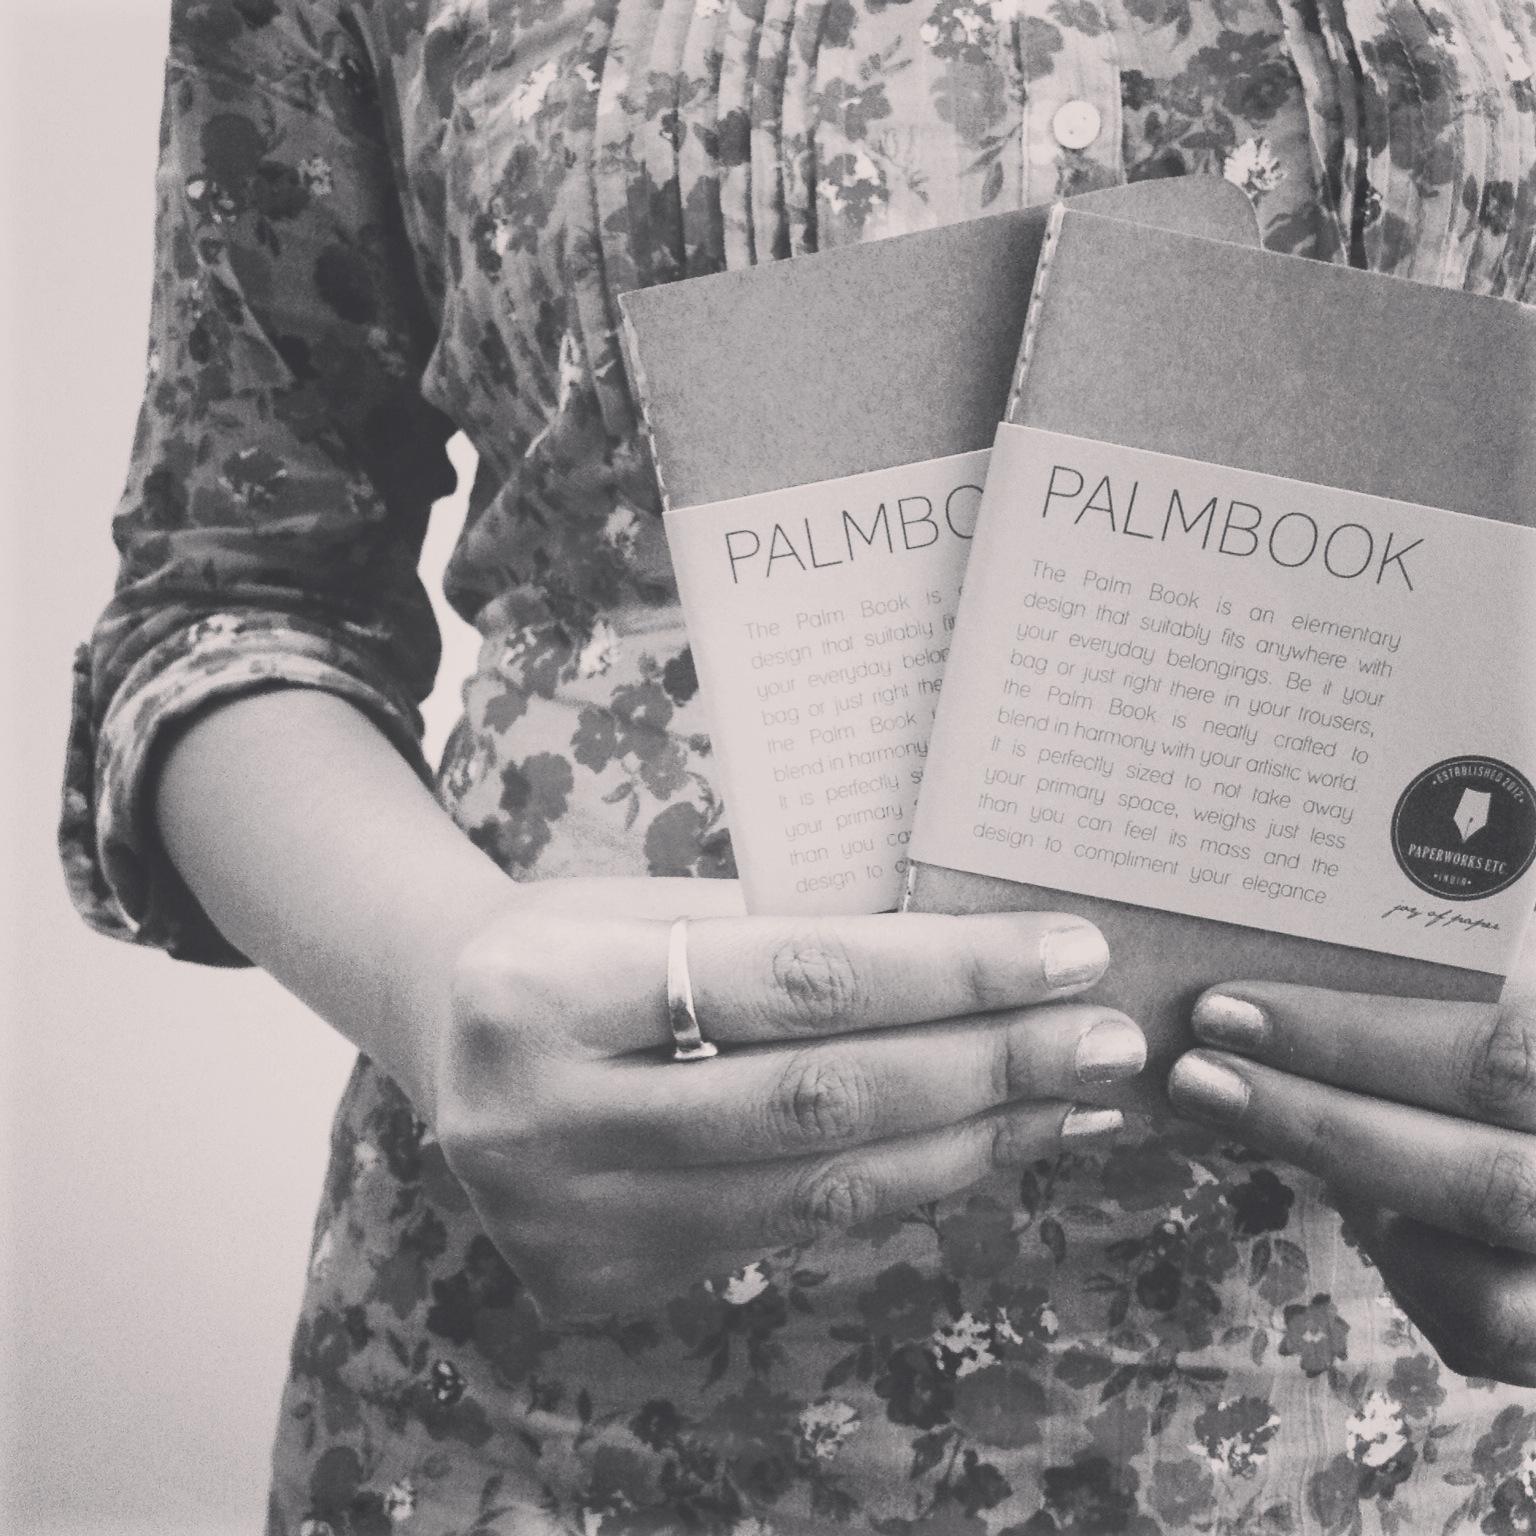 palm book